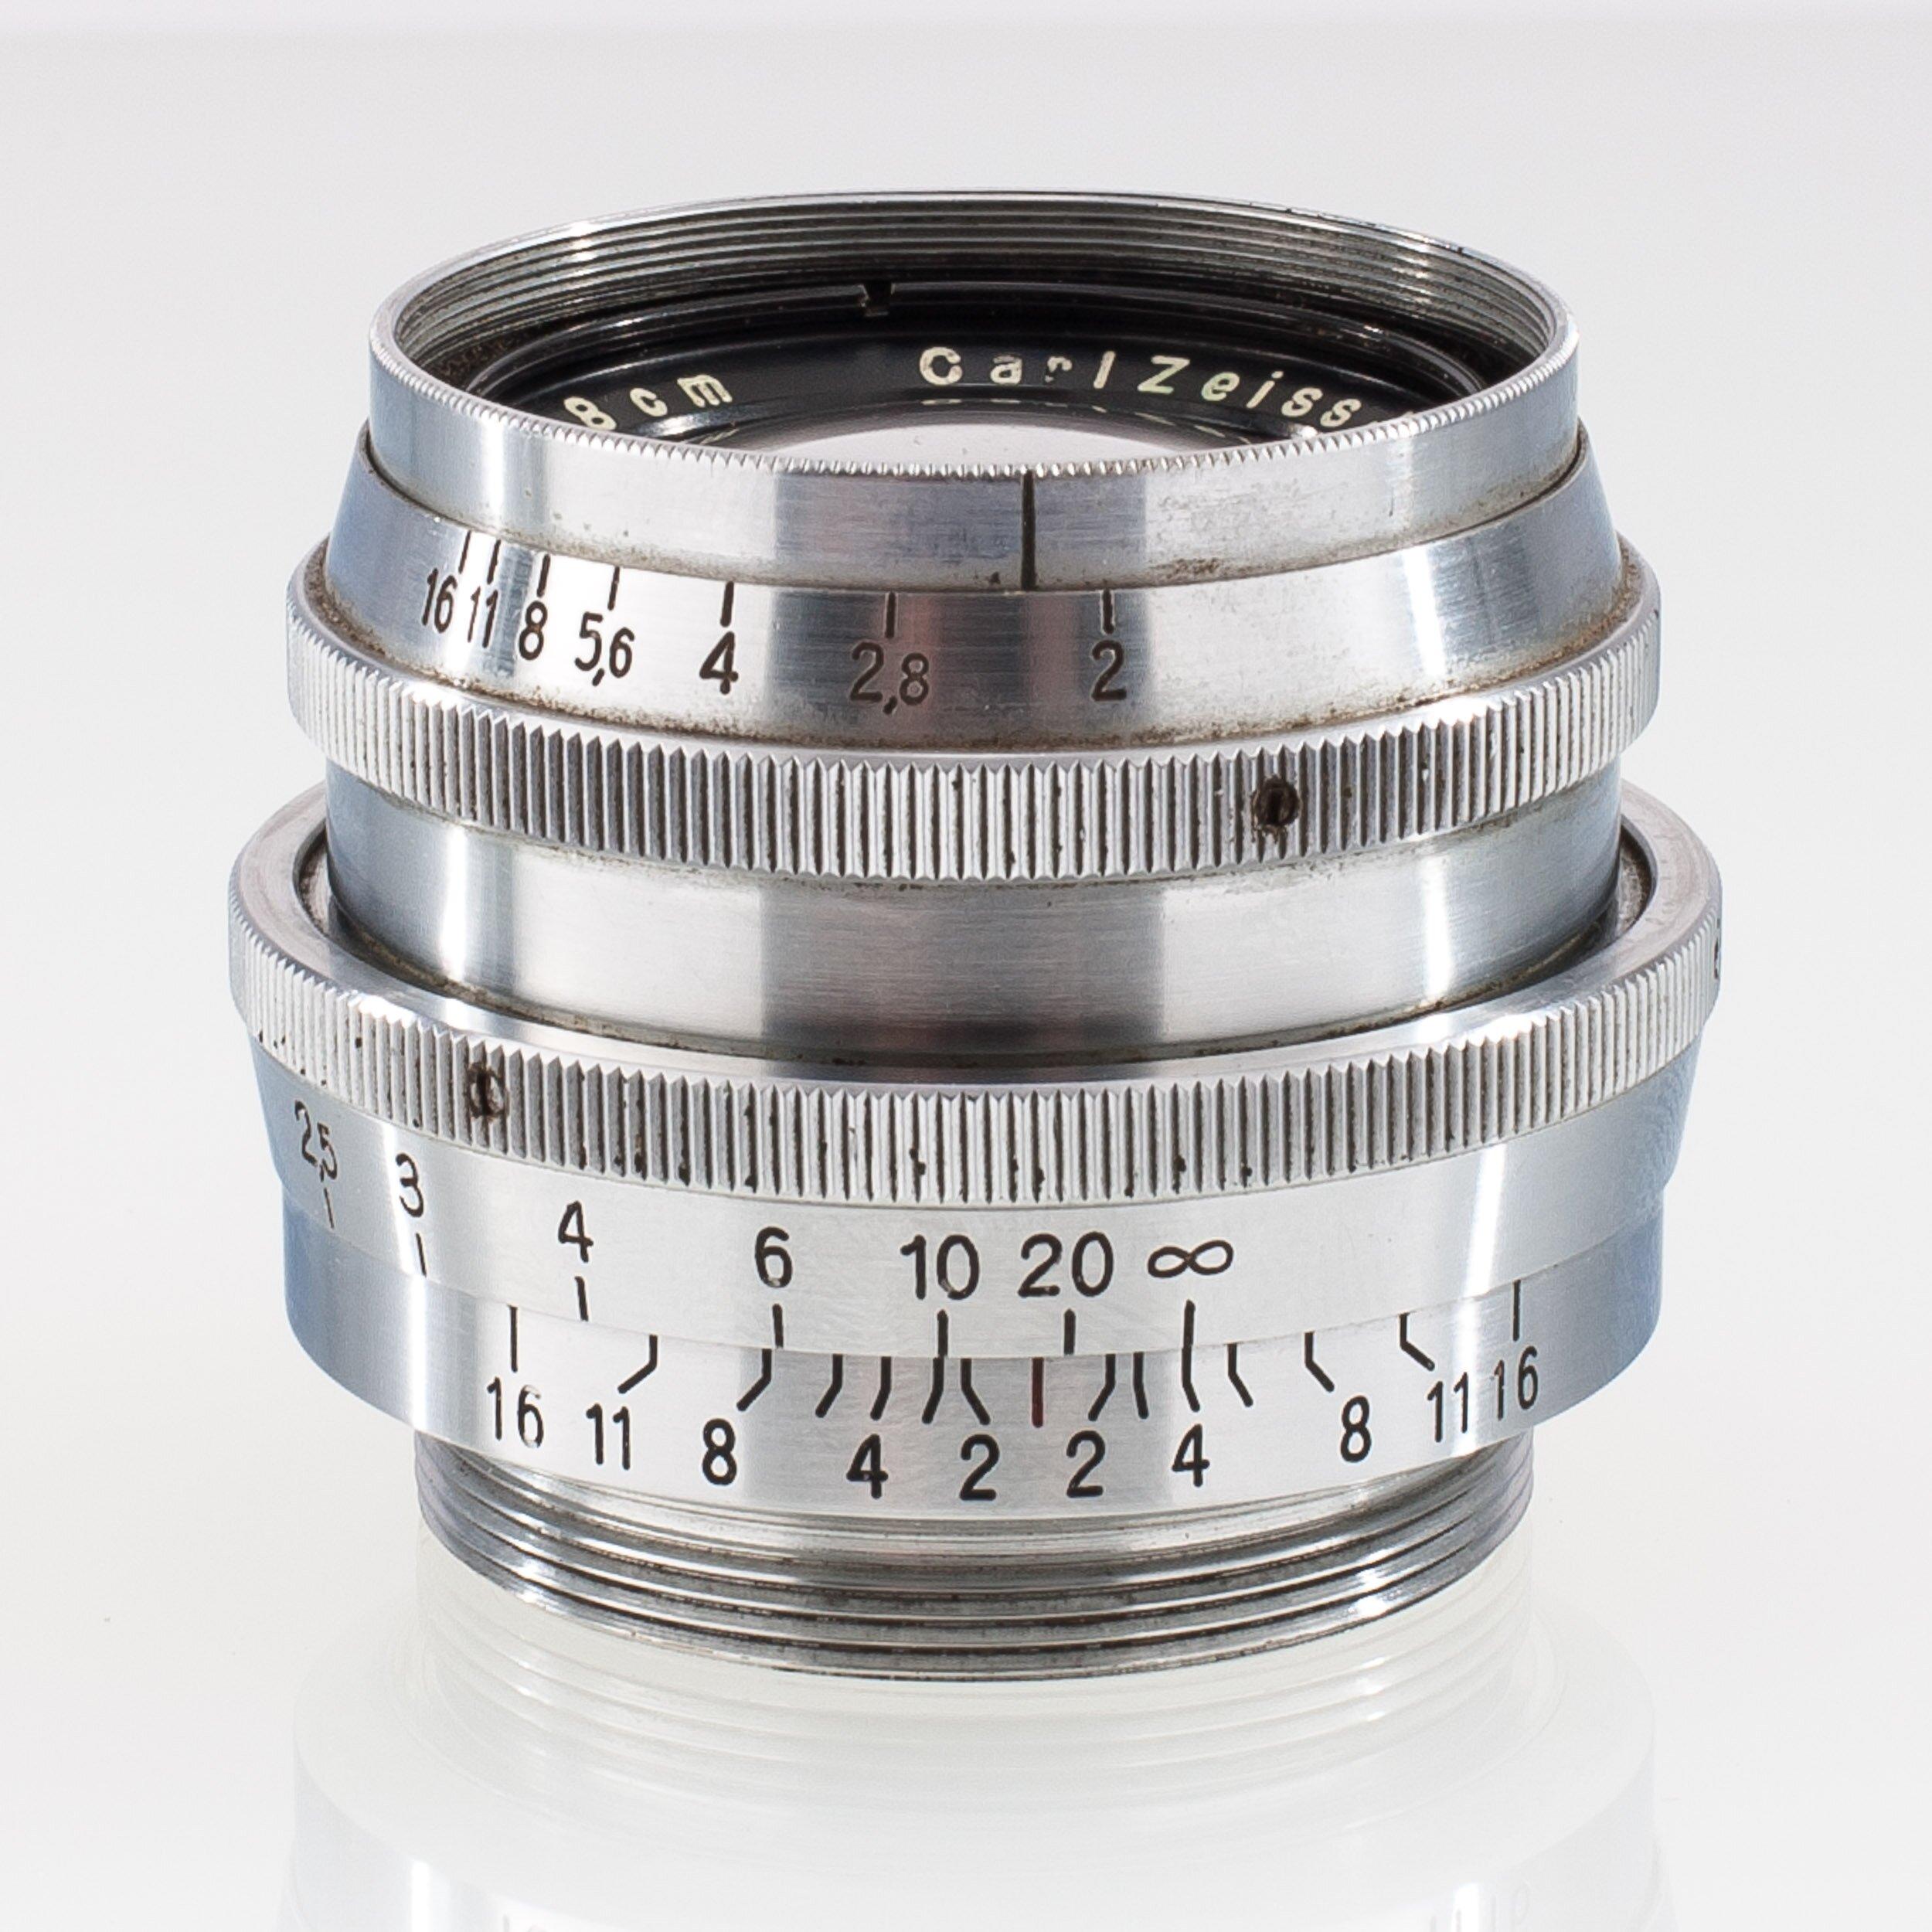 Carl Zeiss M40 f. Praktiflex 2/5,8cm Biotar